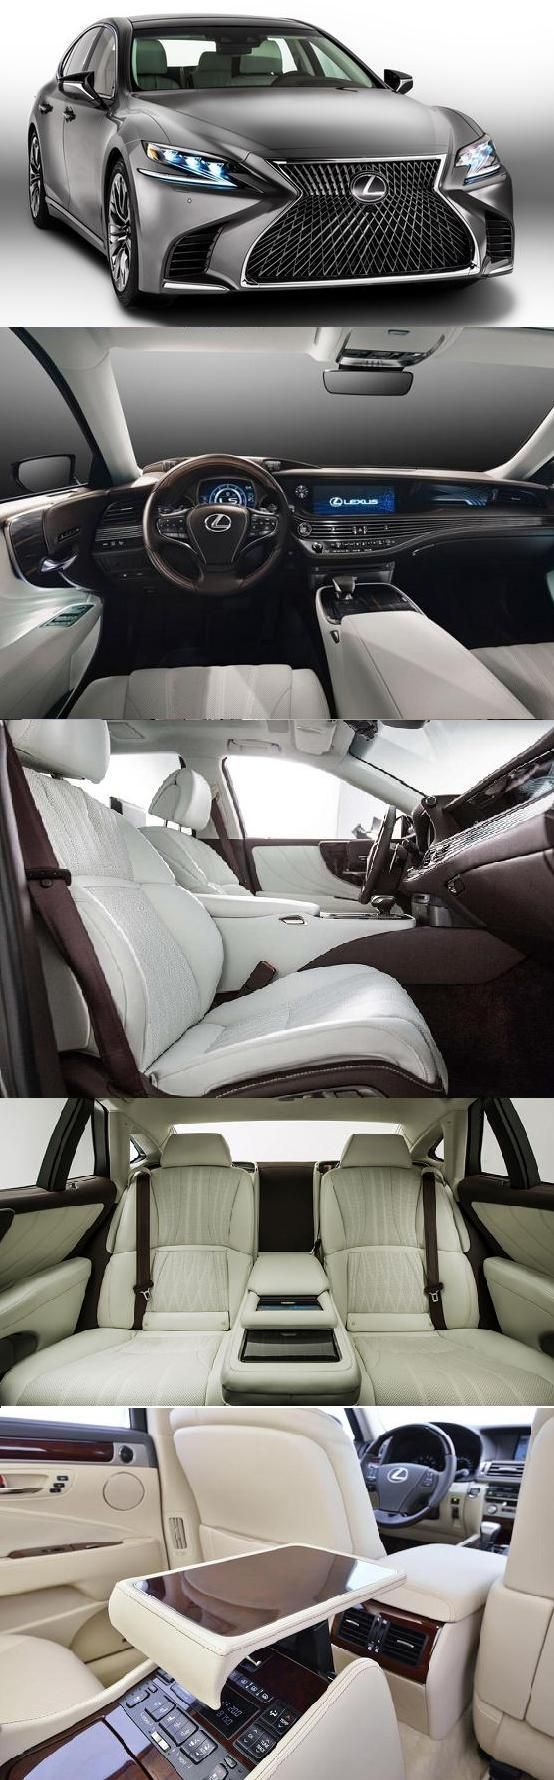 2018 lexus ls 500 luxury interior lexusls500